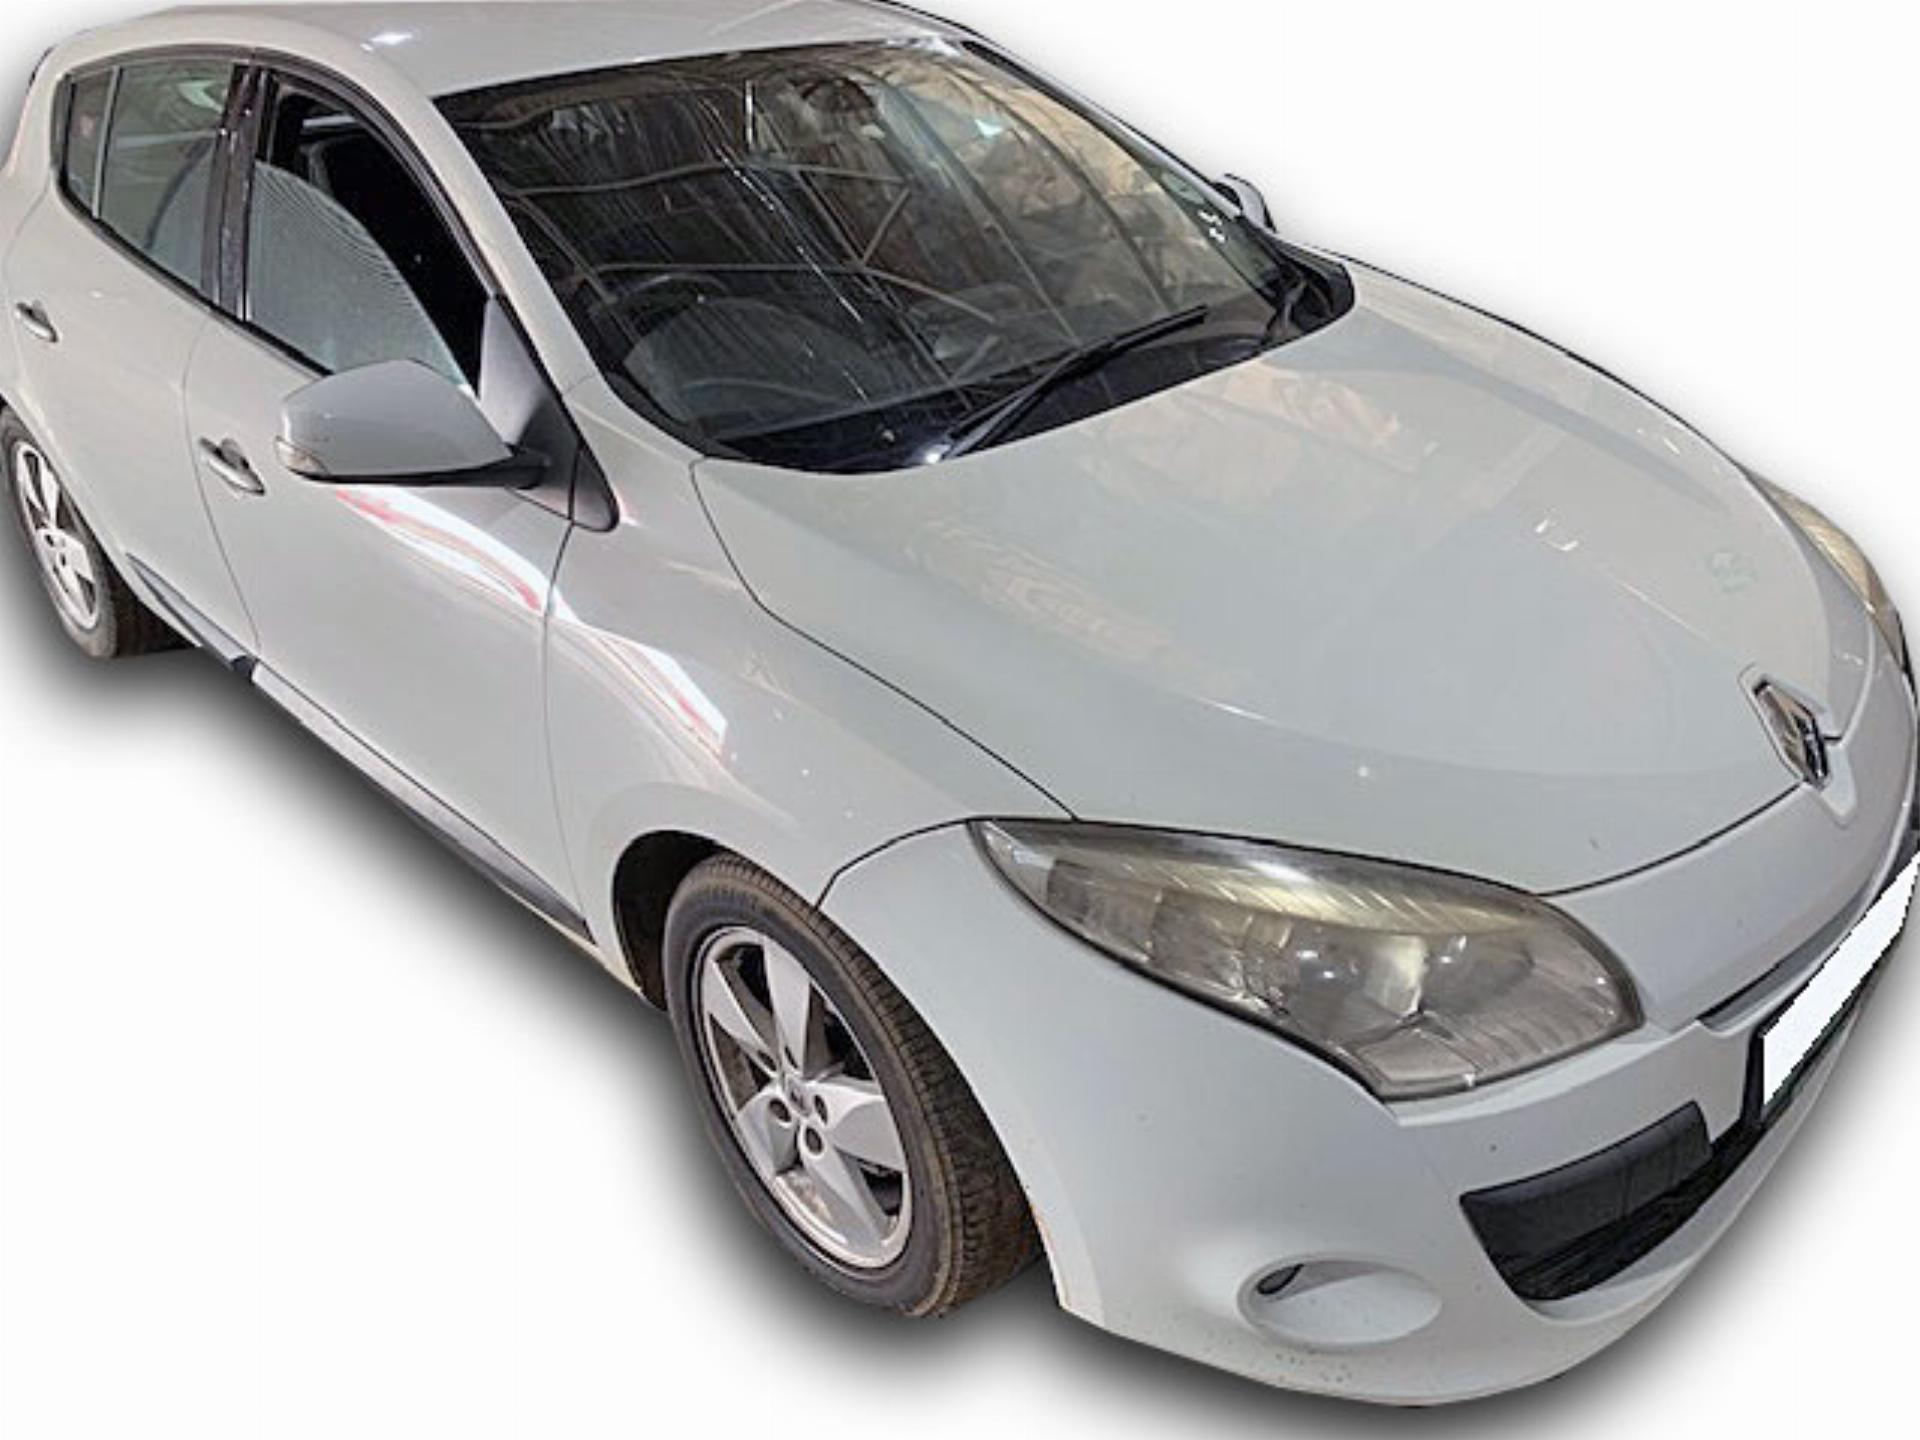 Renault Megane Iii 1.4T Dyna